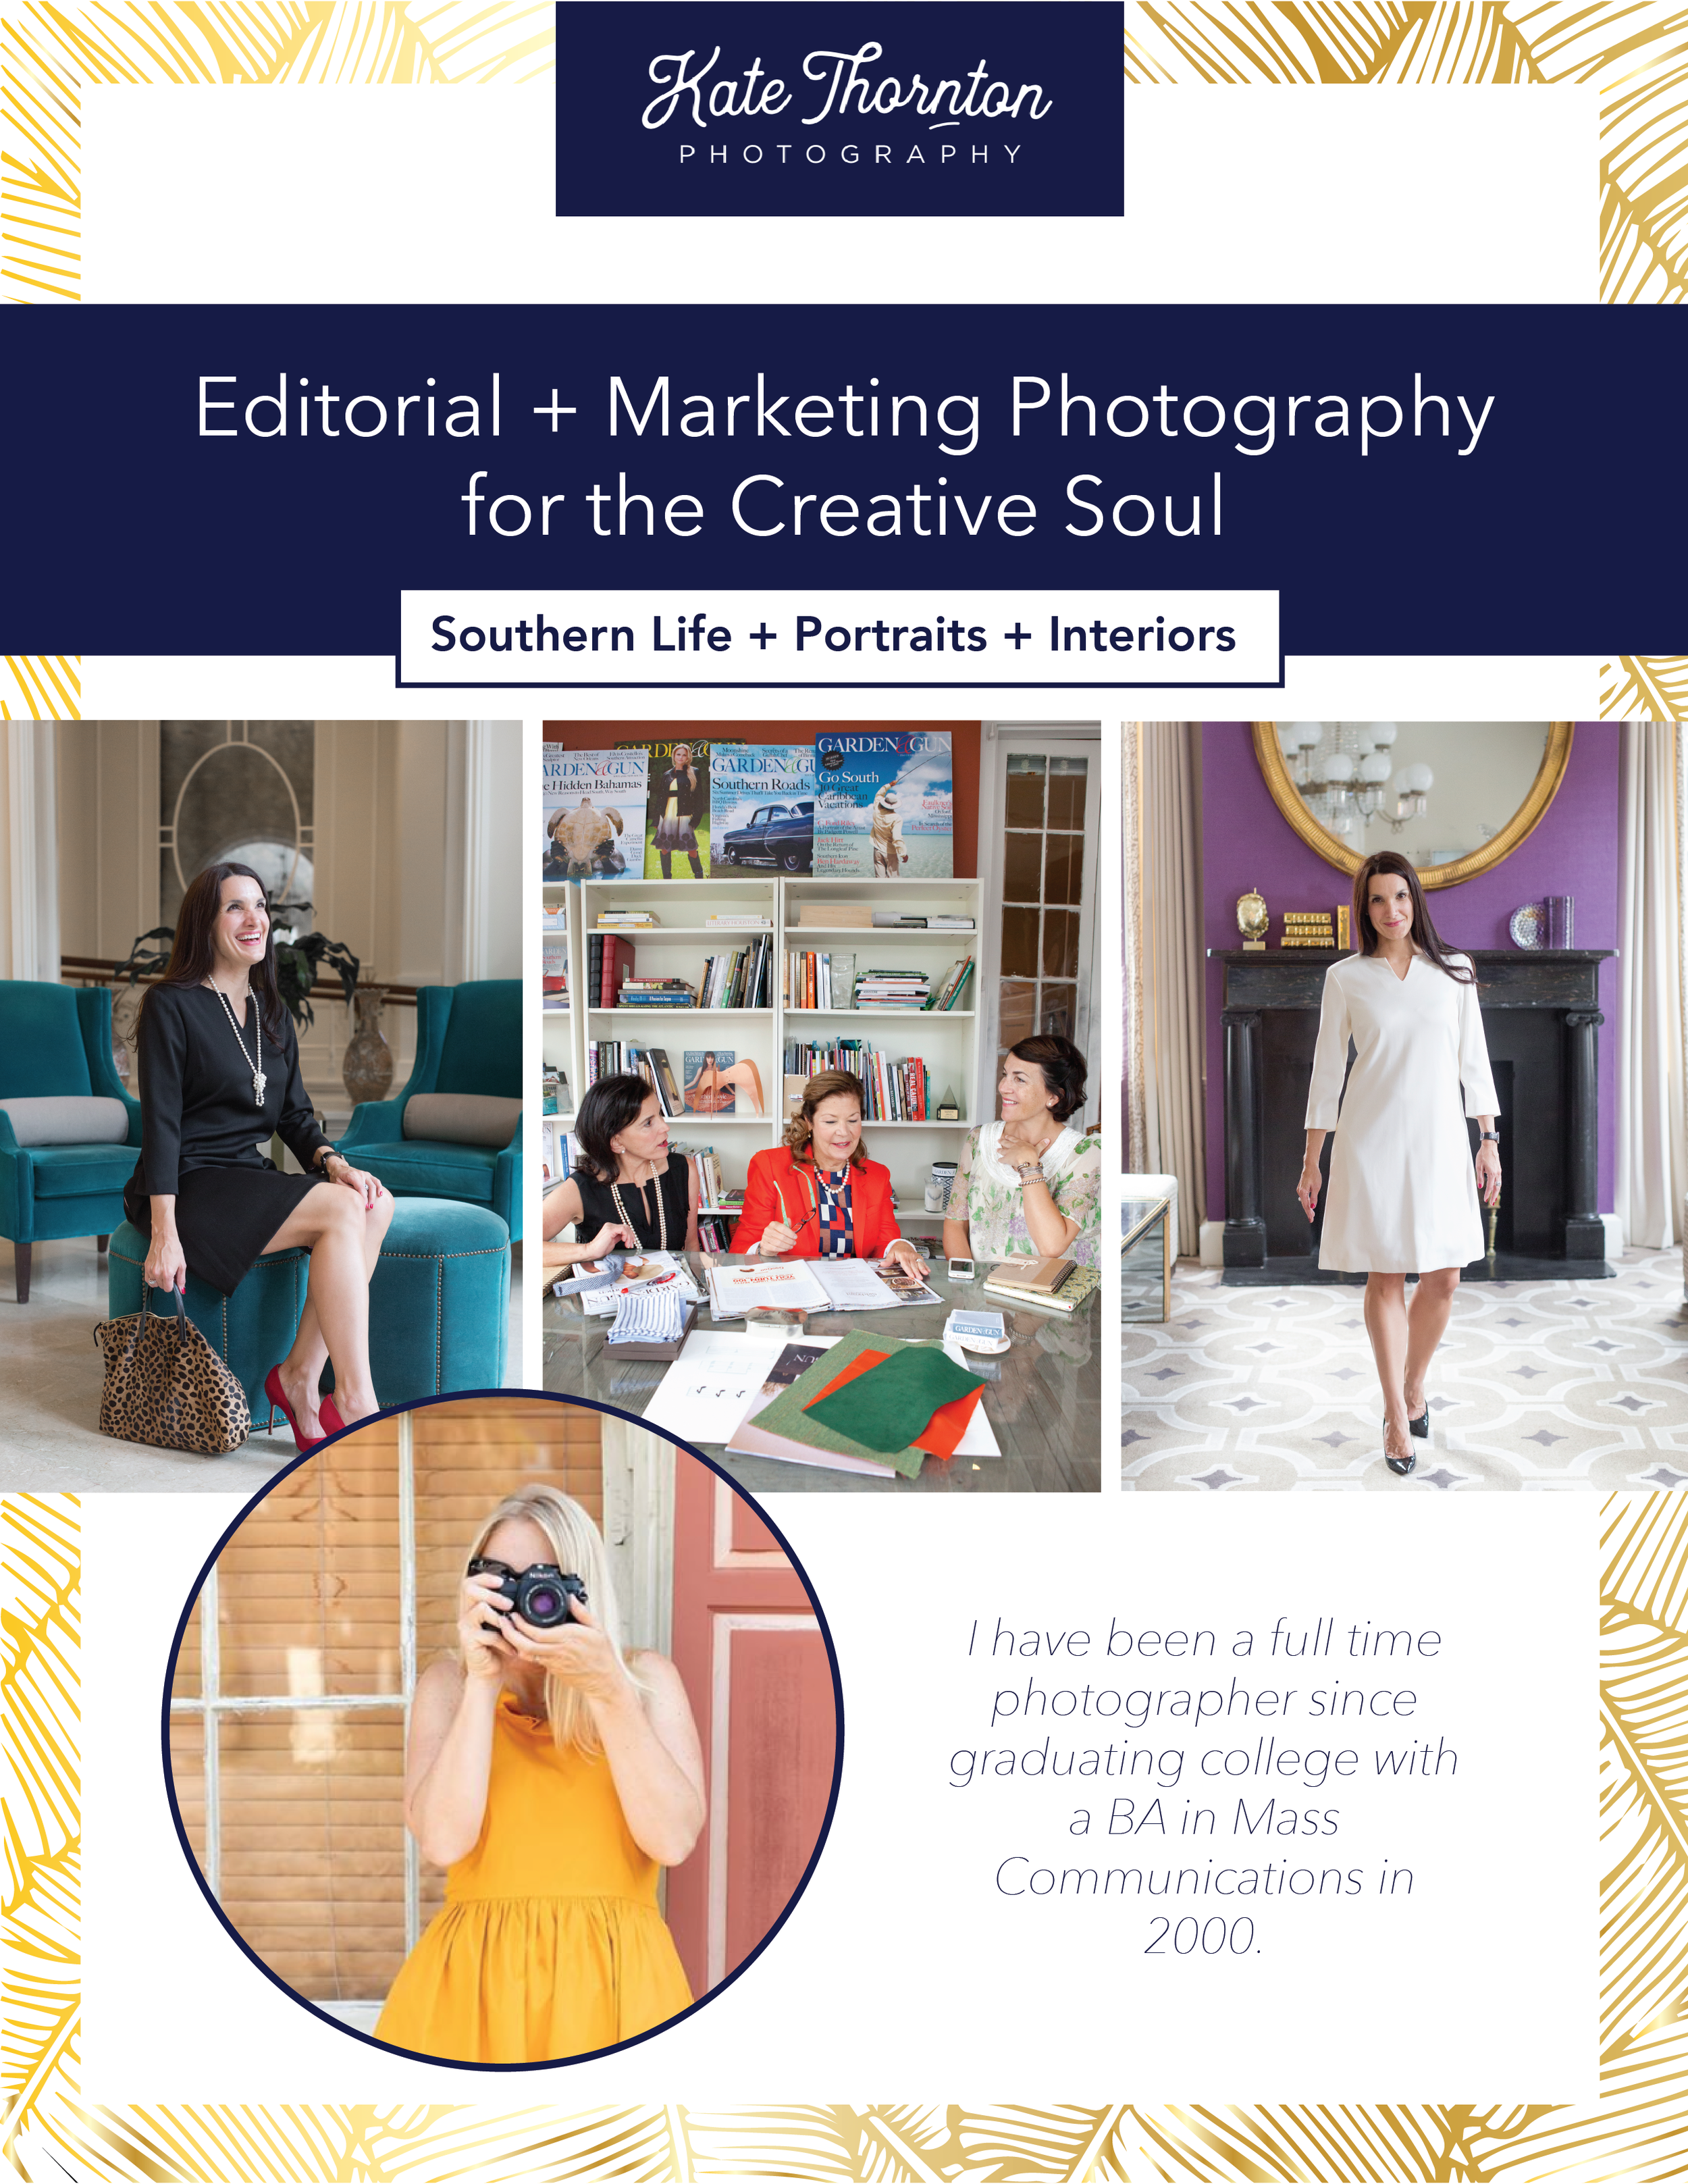 kate-thornton-photography-charleston-artist-media-kit-design-pr-management-verb